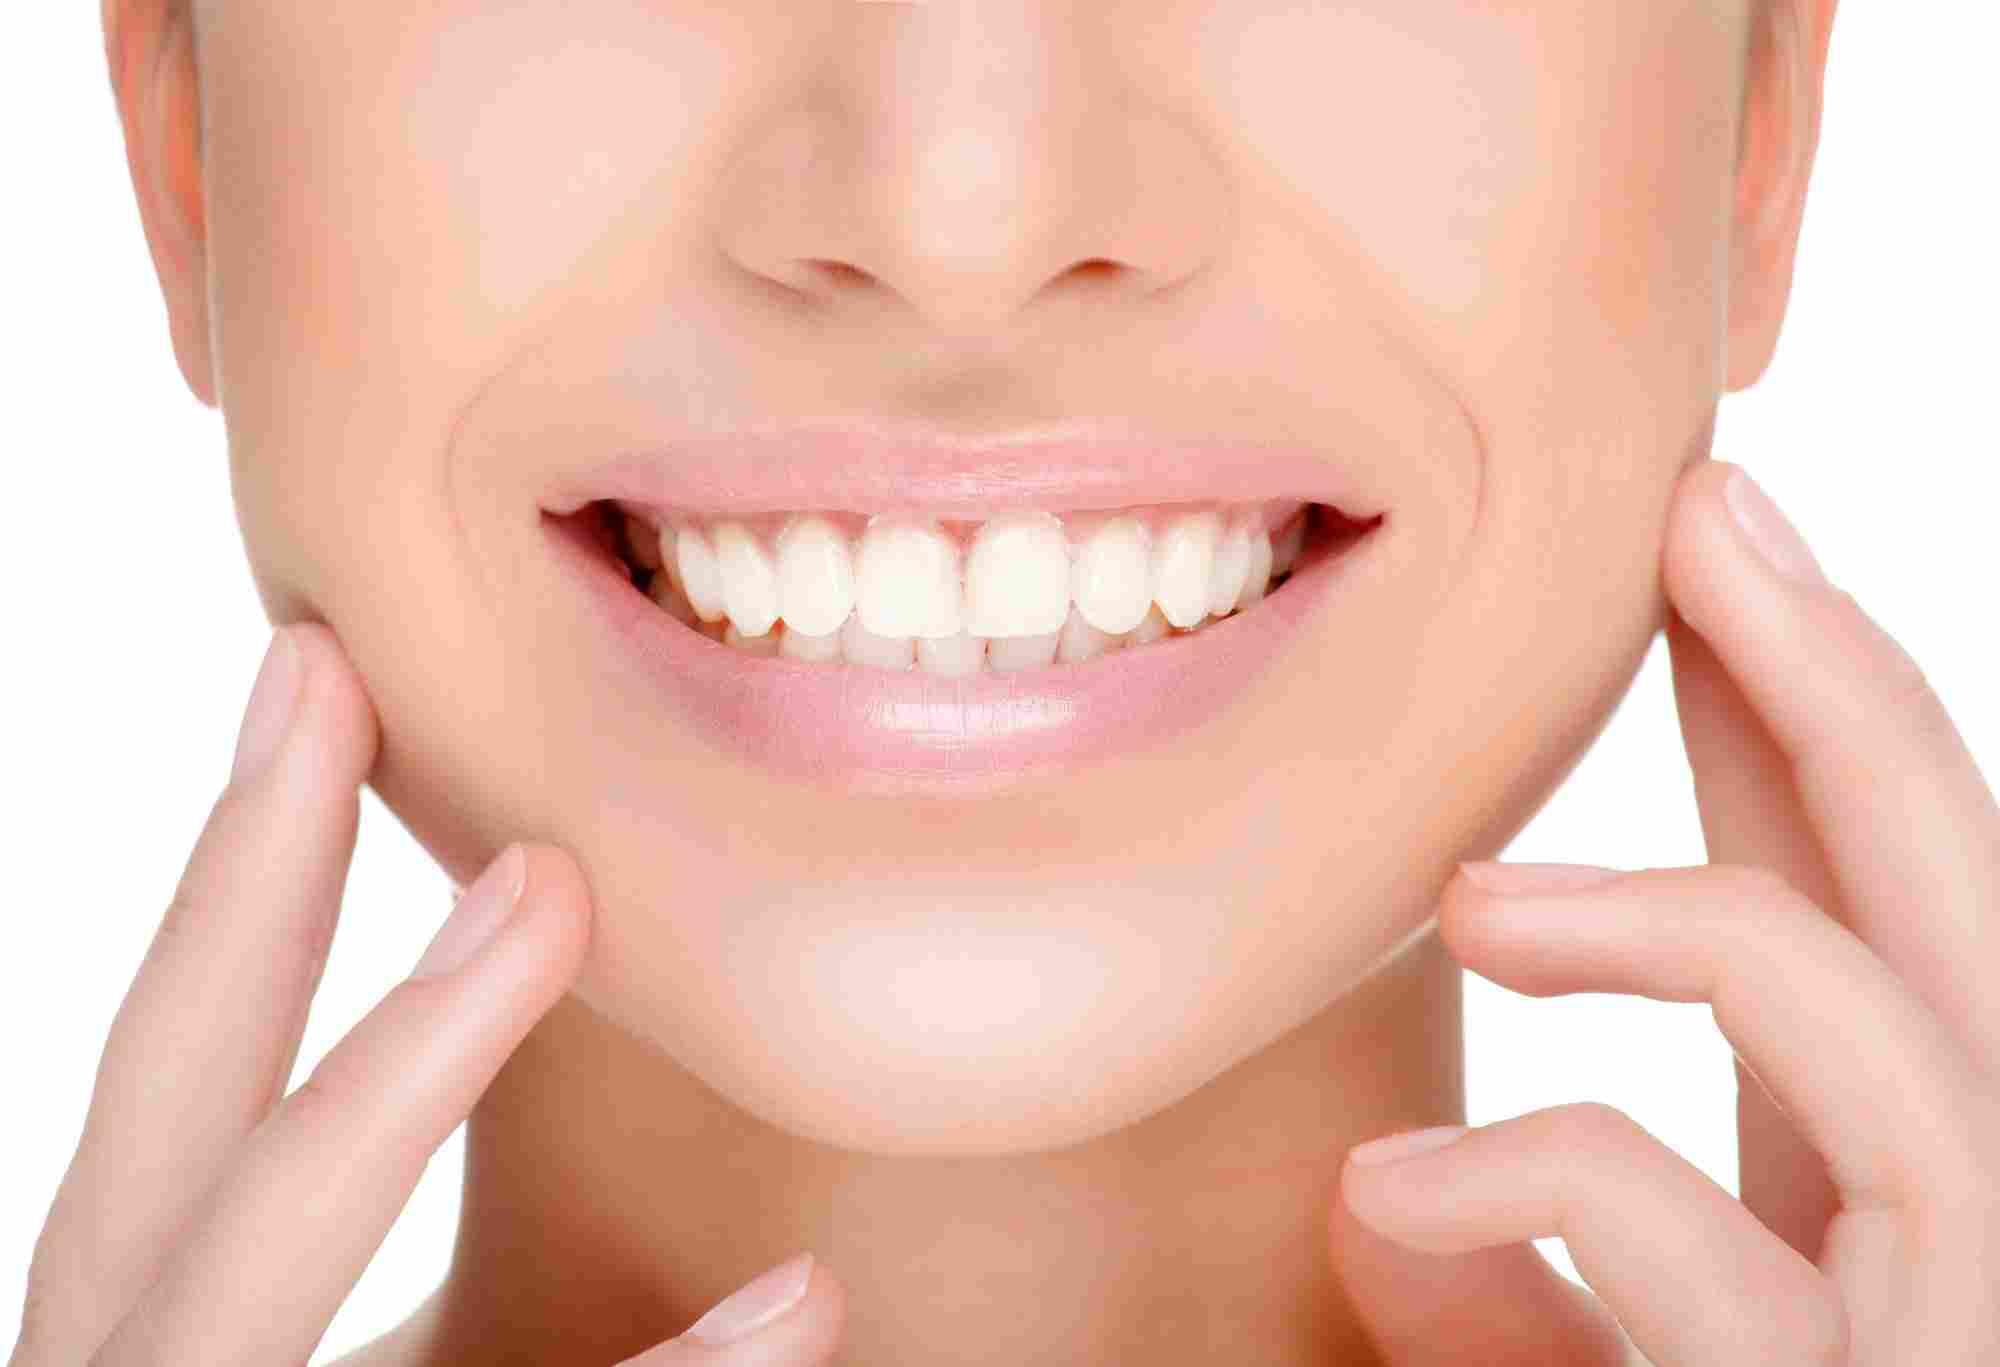 http://dentalplus.ro/wp-content/uploads/2015/07/shutterstock_192351722.jpg